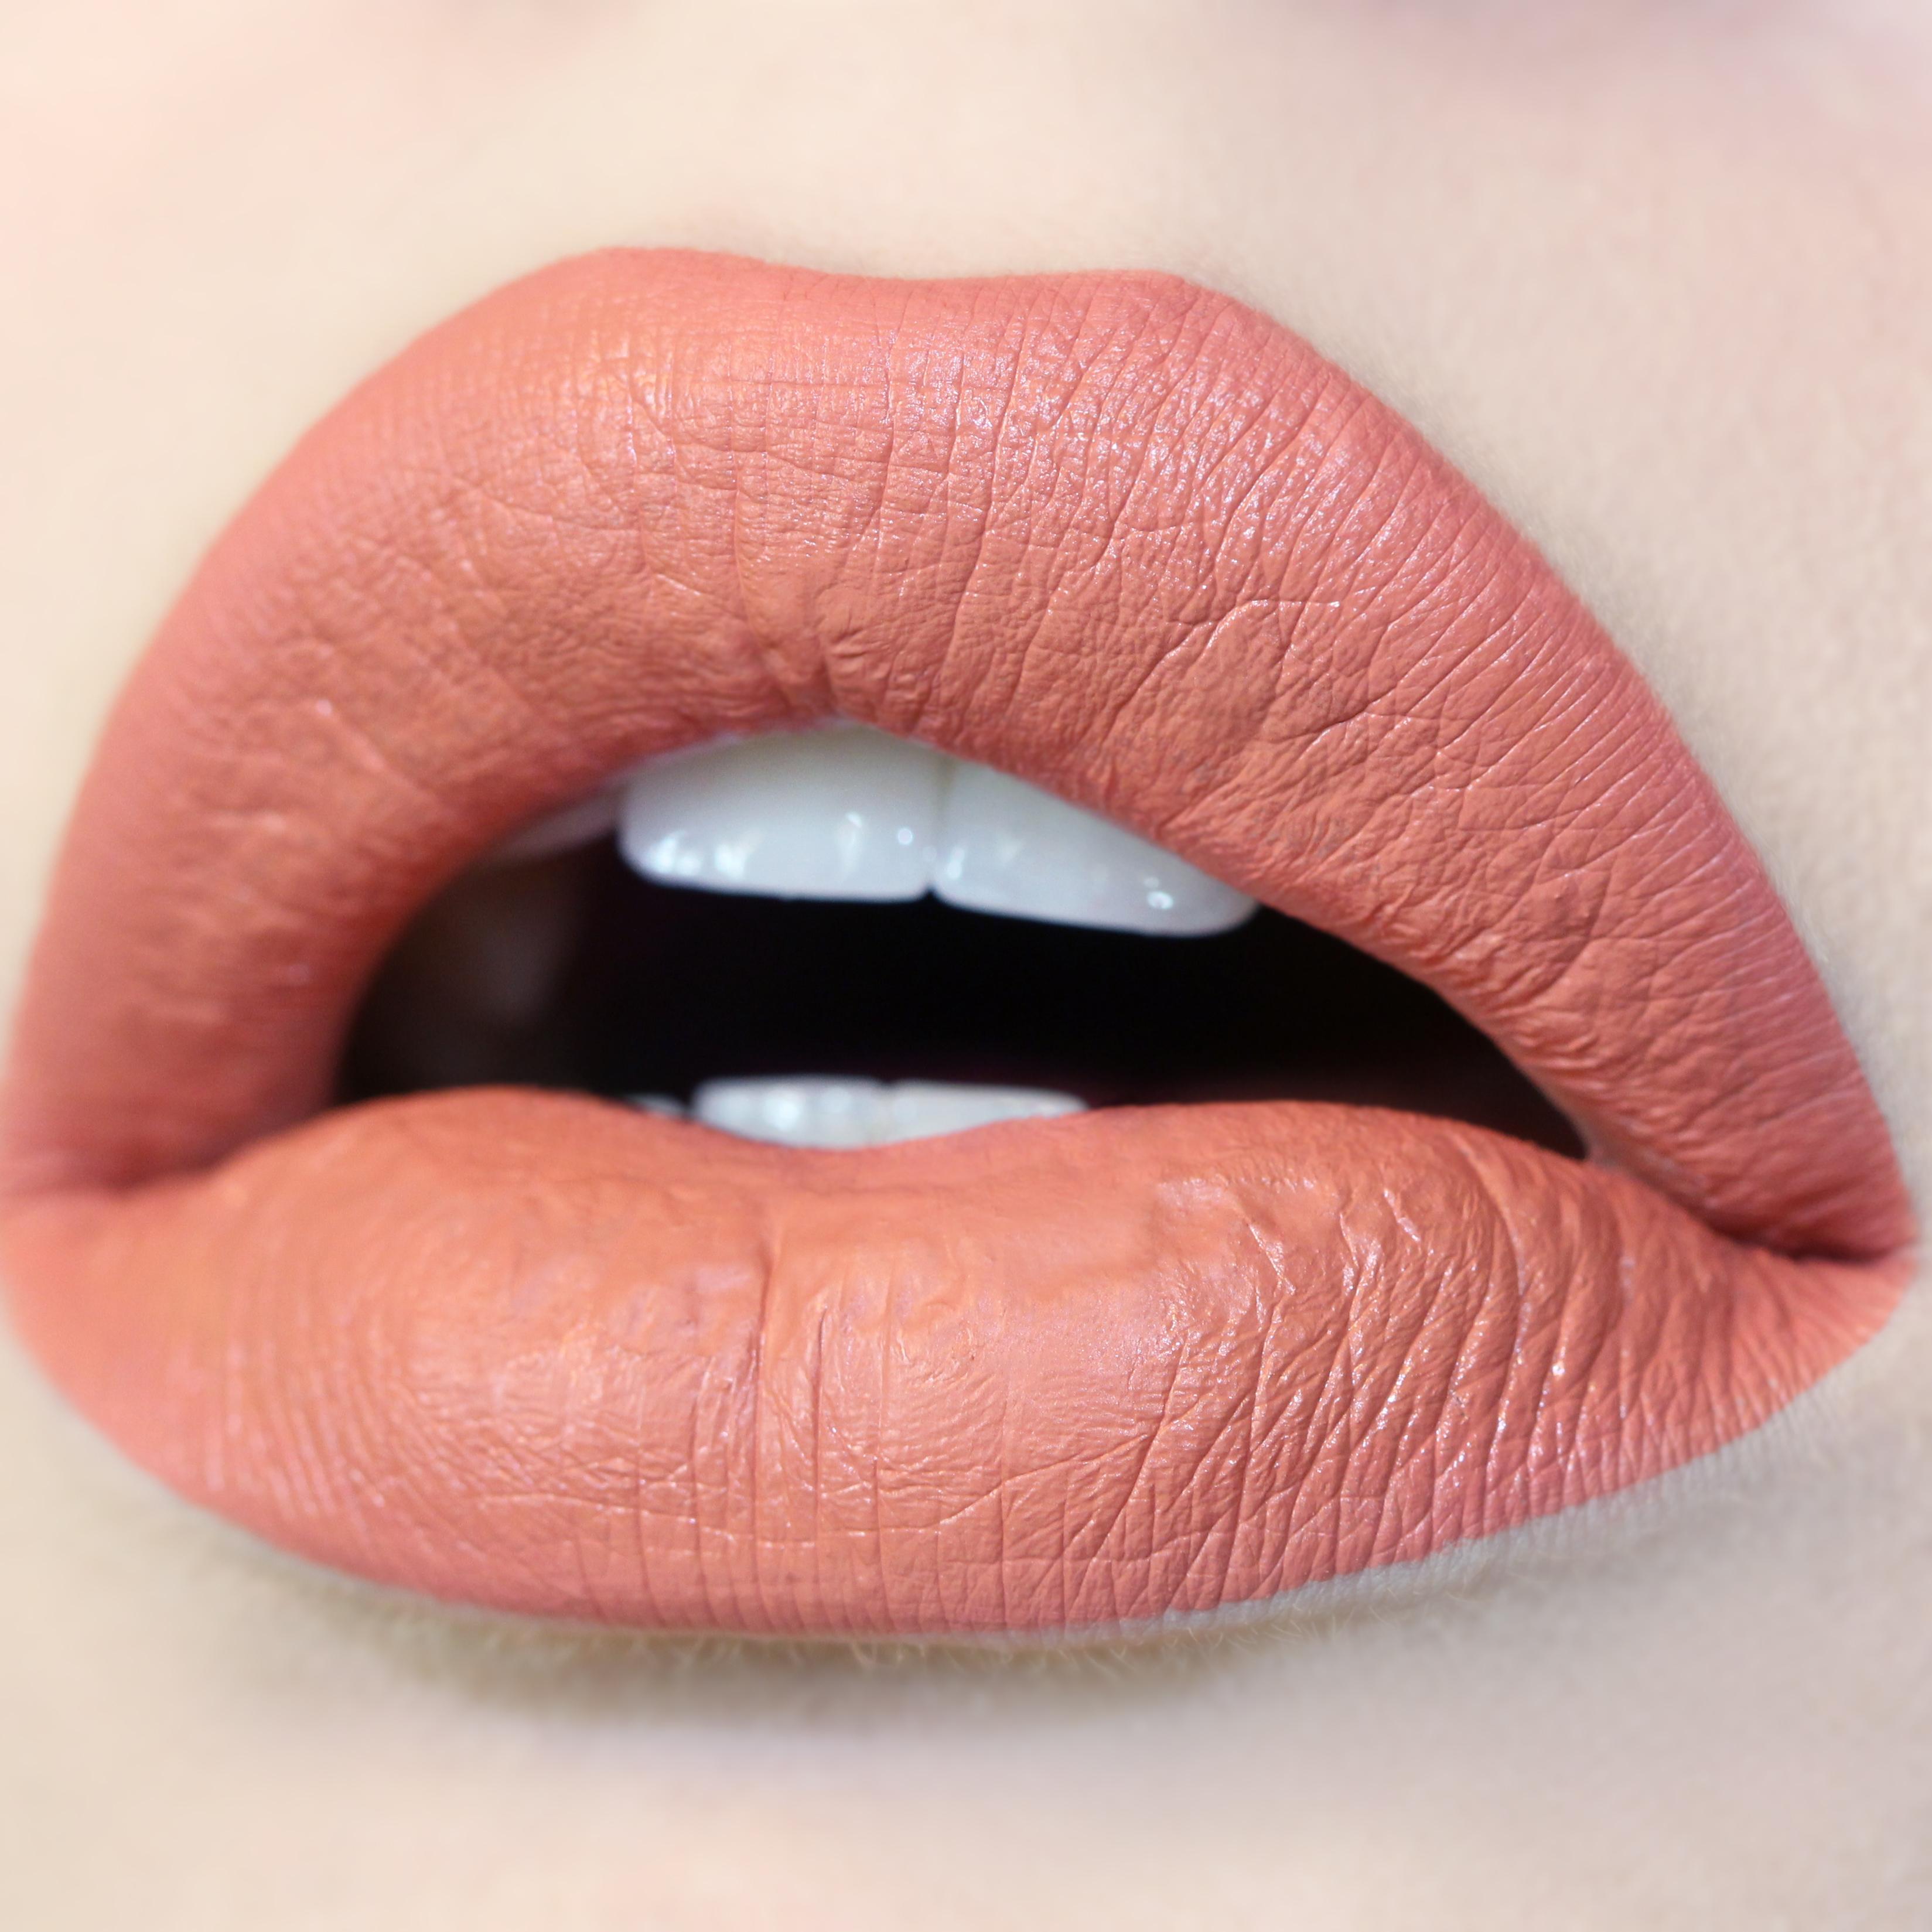 colourpop ultra matte lip สี instigator